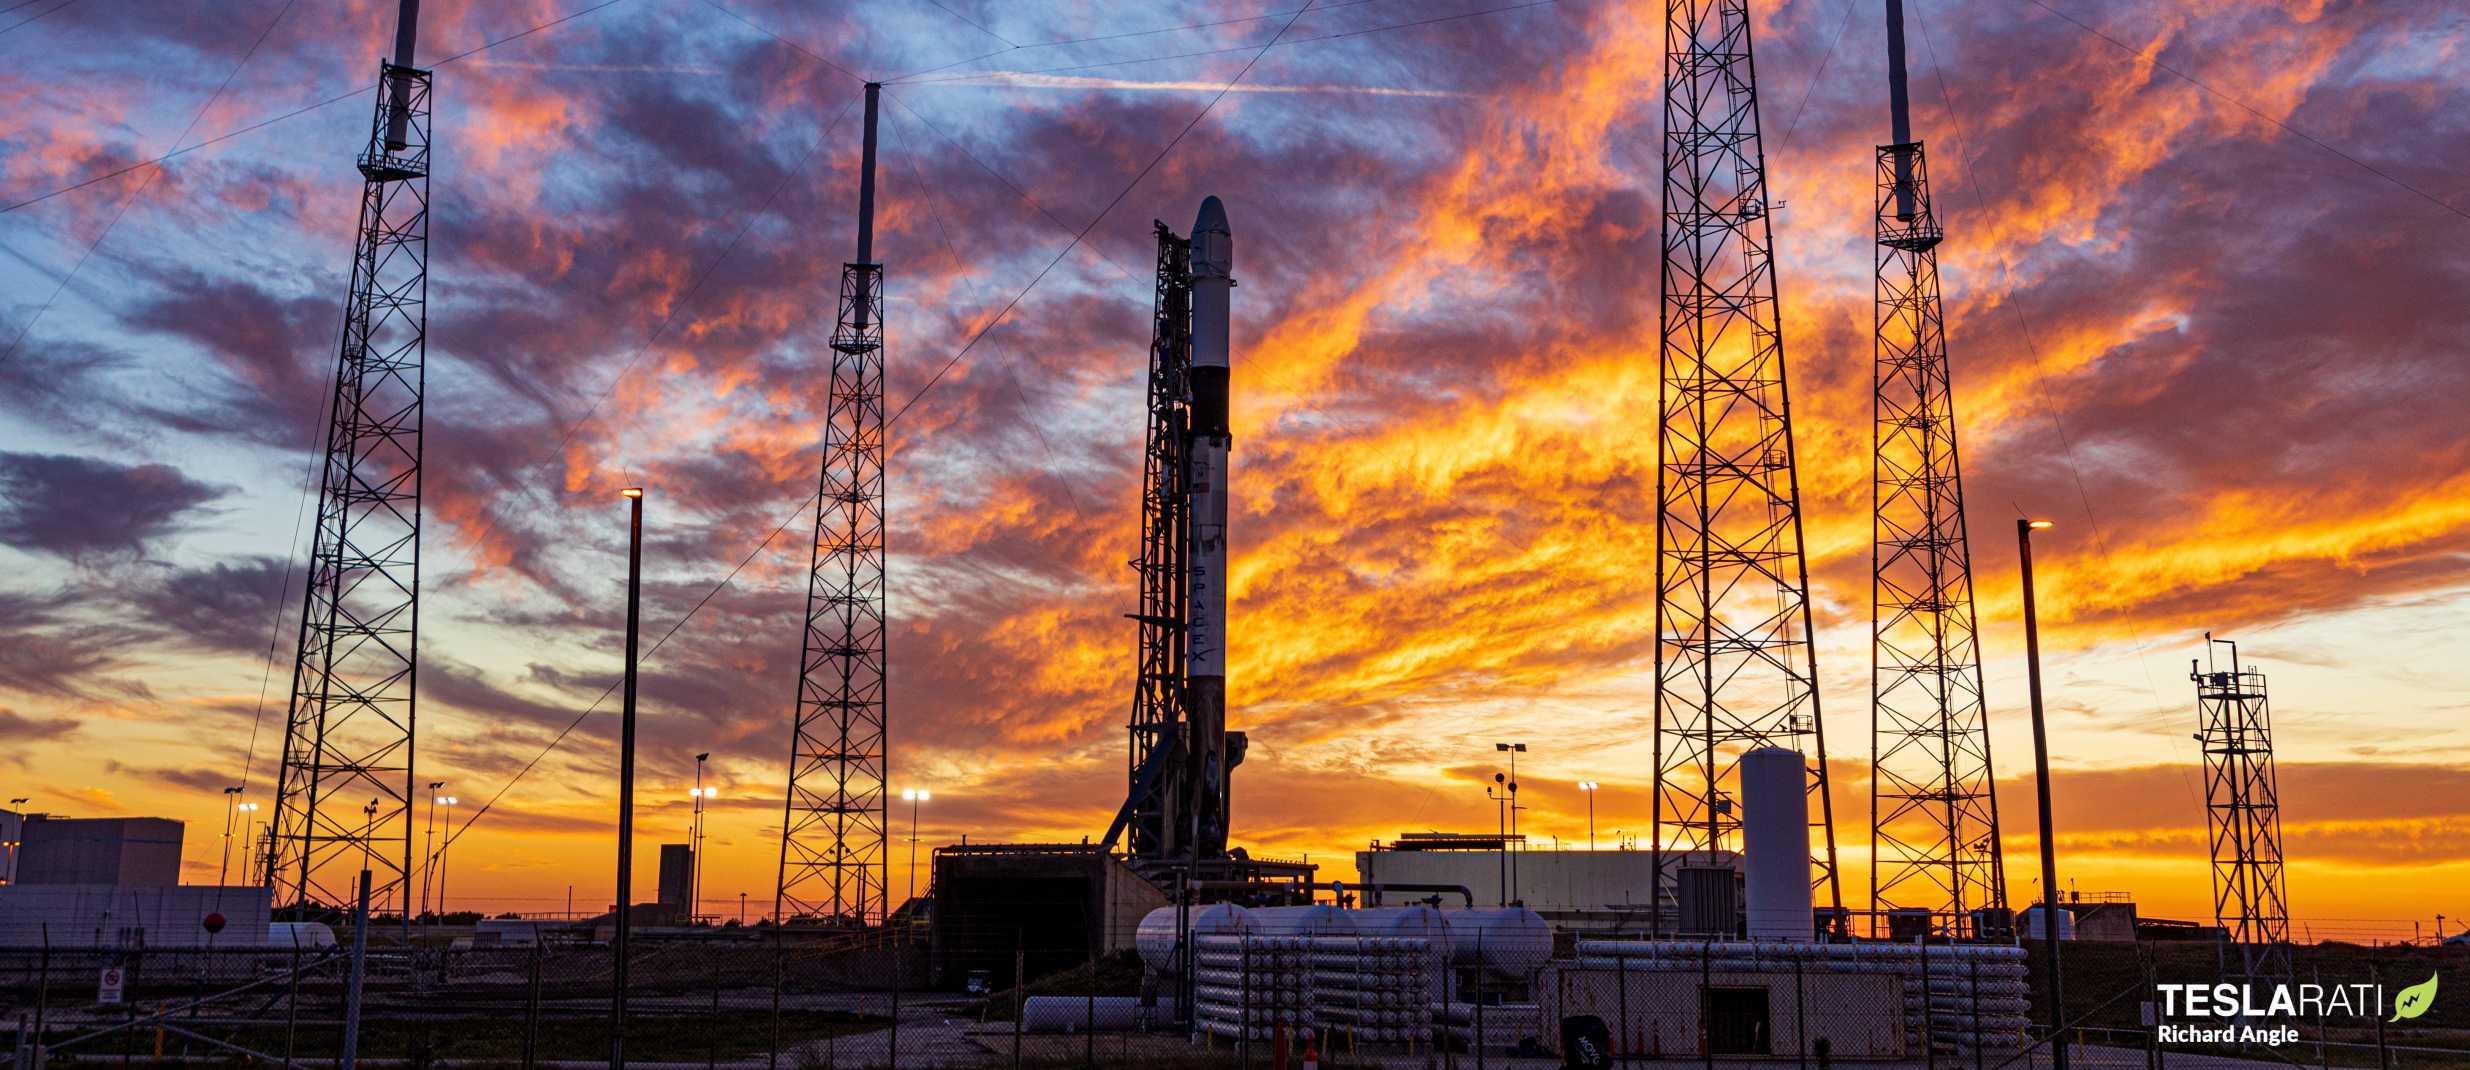 CRS-20 Dragon C112 Falcon 9 B1059 (Richard Angle) pre launch landing (7) crop (c)